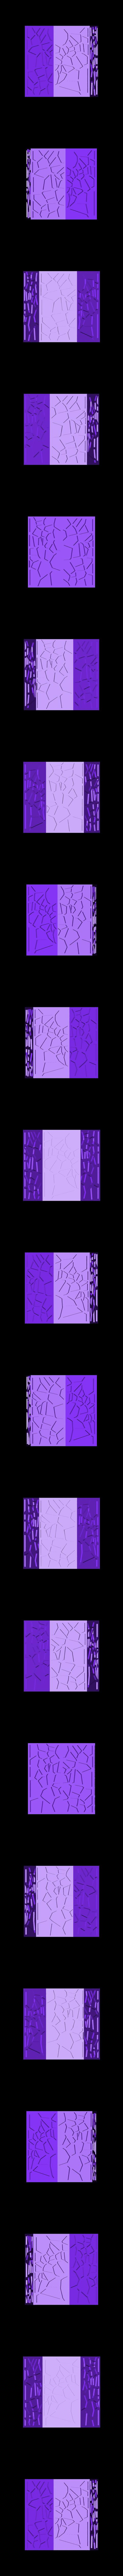 voronoi_hex_module.stl Download free STL file Modular Hex Drawers • Design to 3D print, O3D